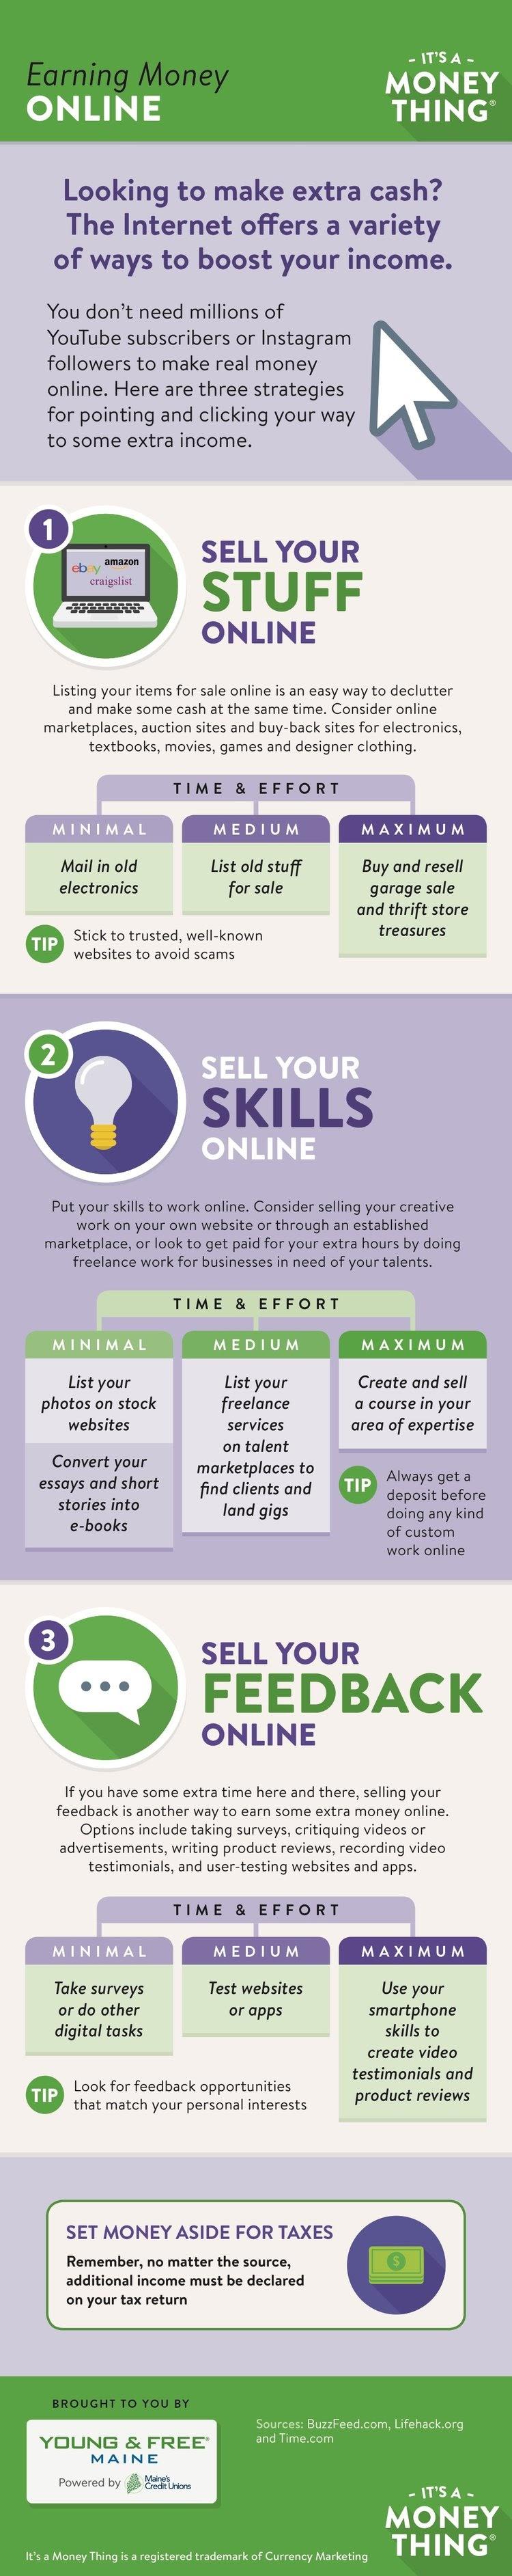 Earning Money Online - #infographic